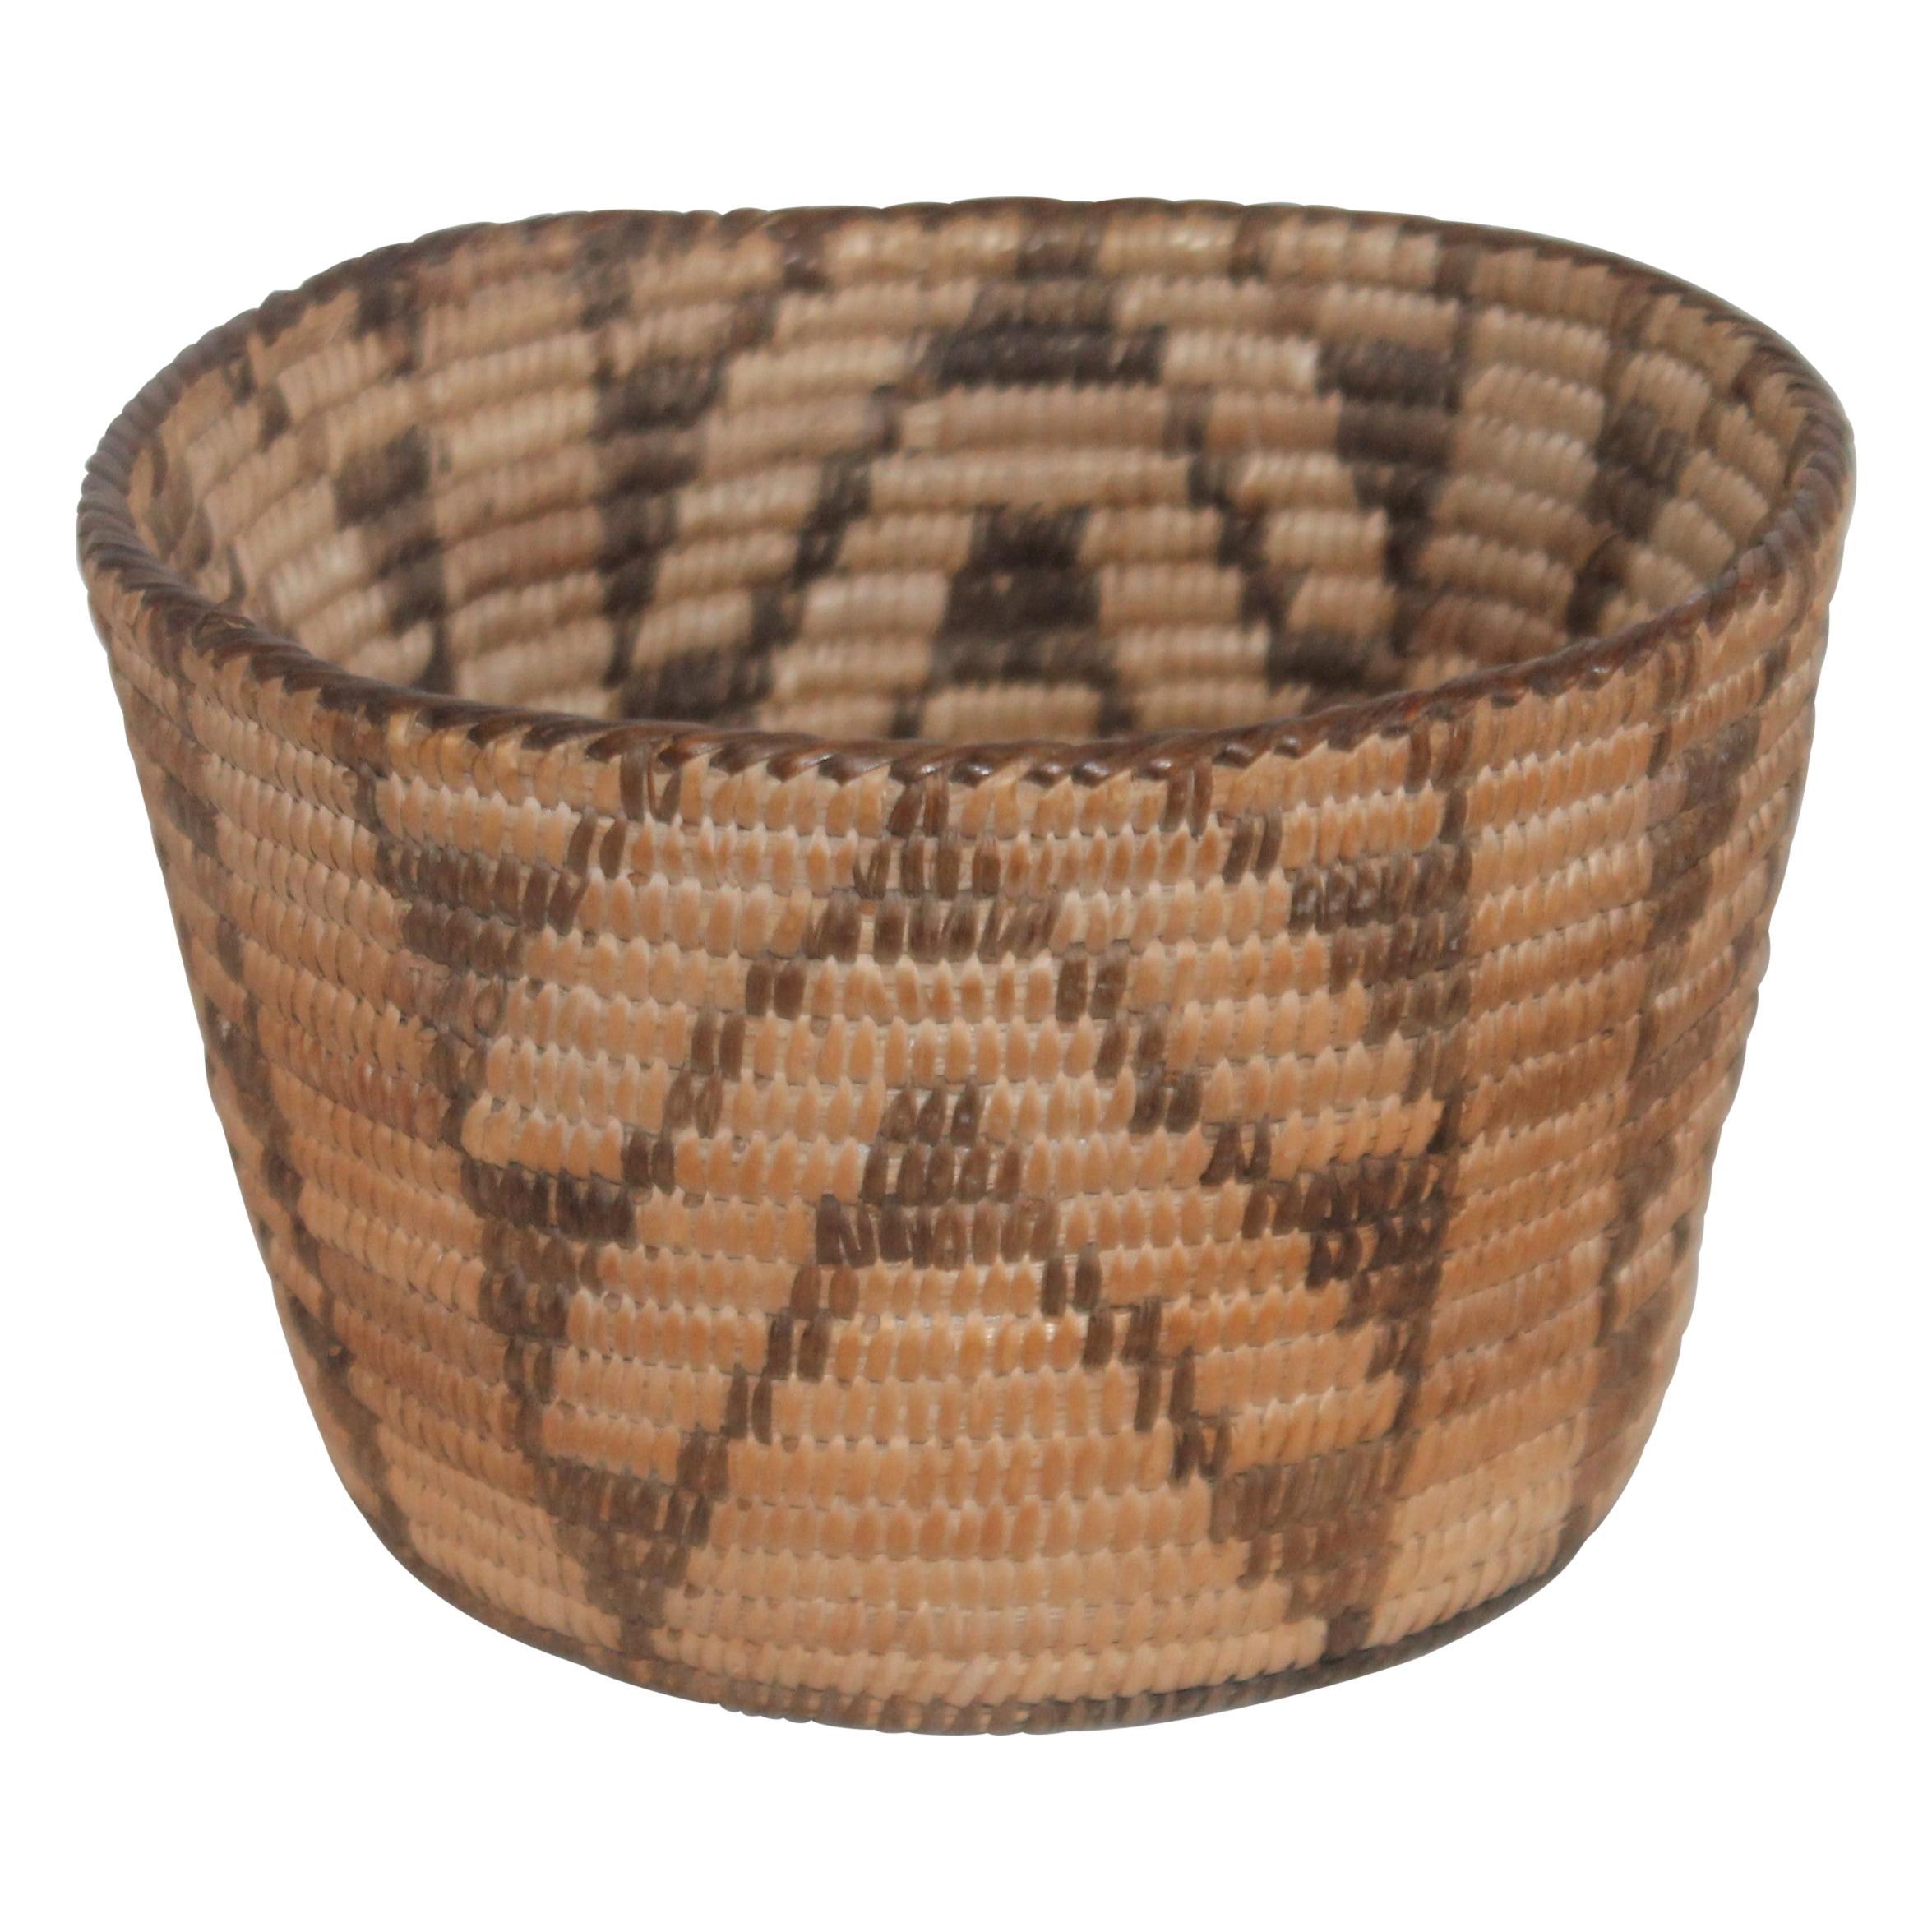 Pima American Indian Basket